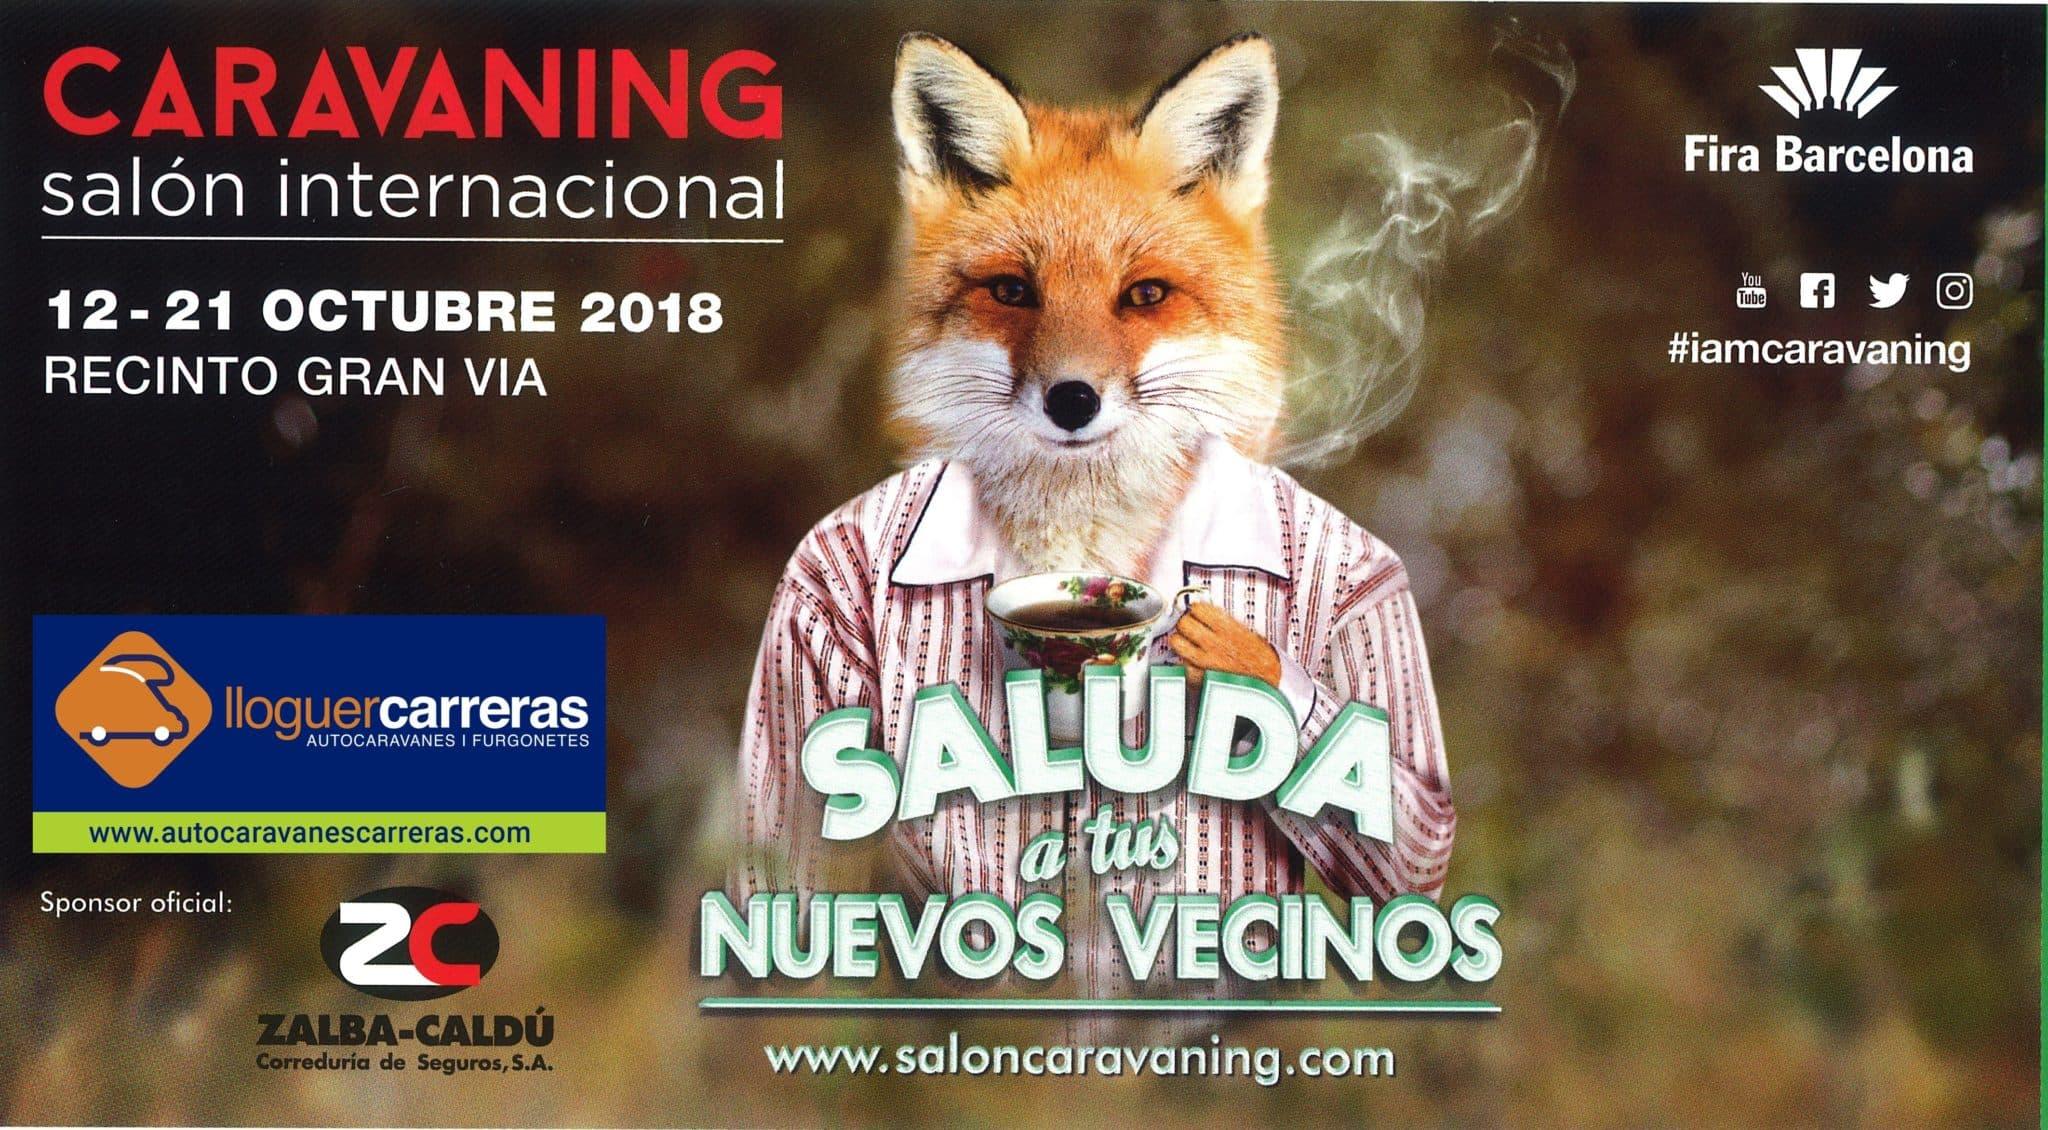 Saló Caravaning a Barcelona 2